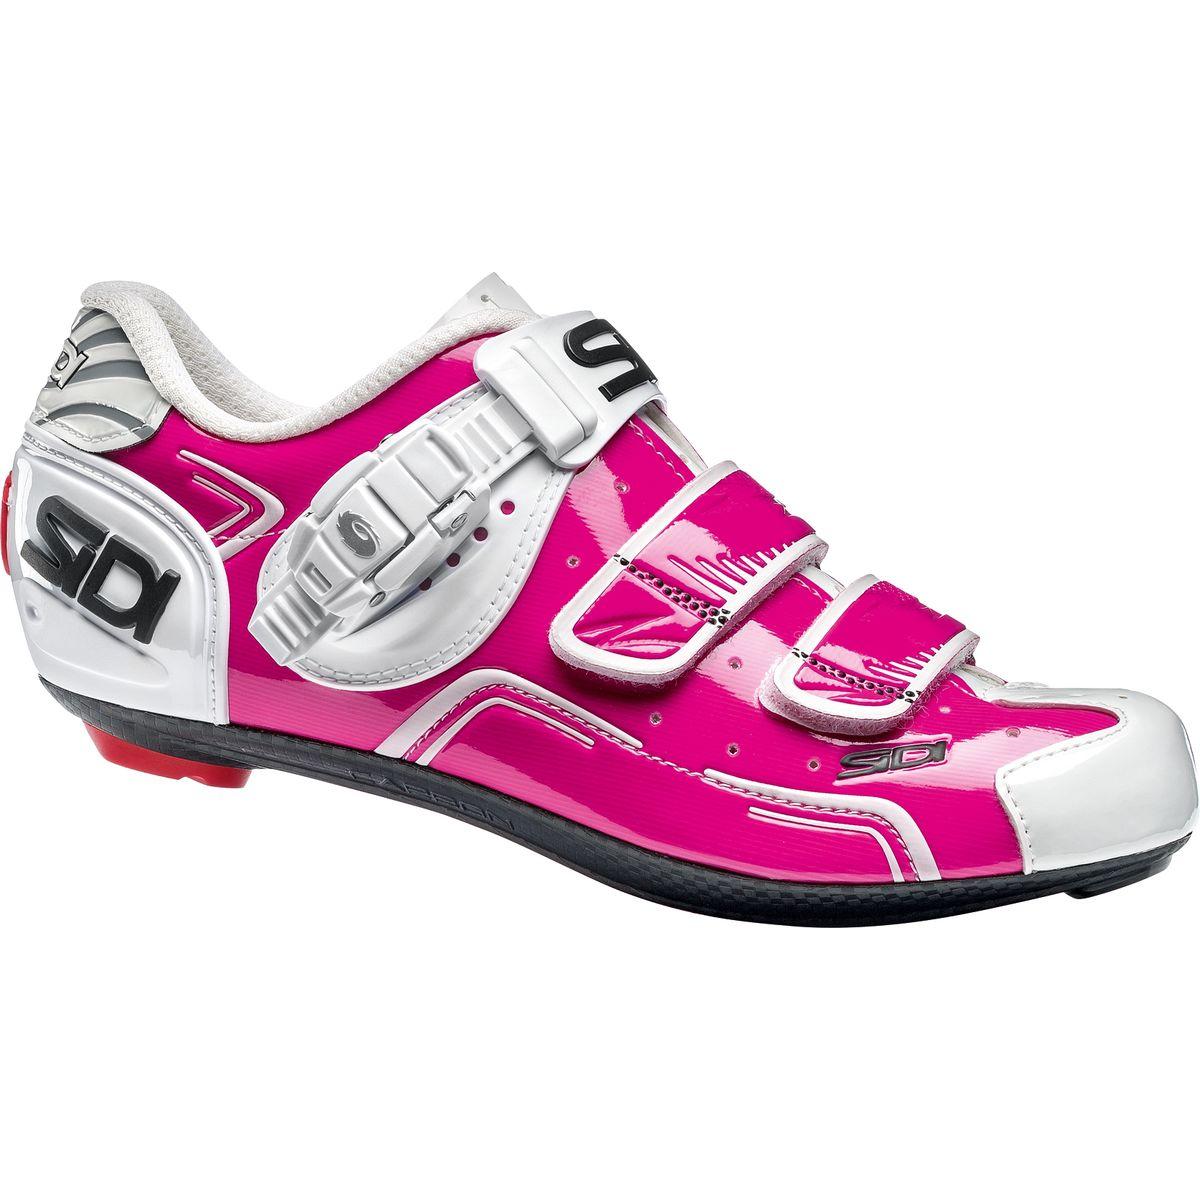 9Y0U Sidi Buvel Shoes Womens Fuchsia Popular